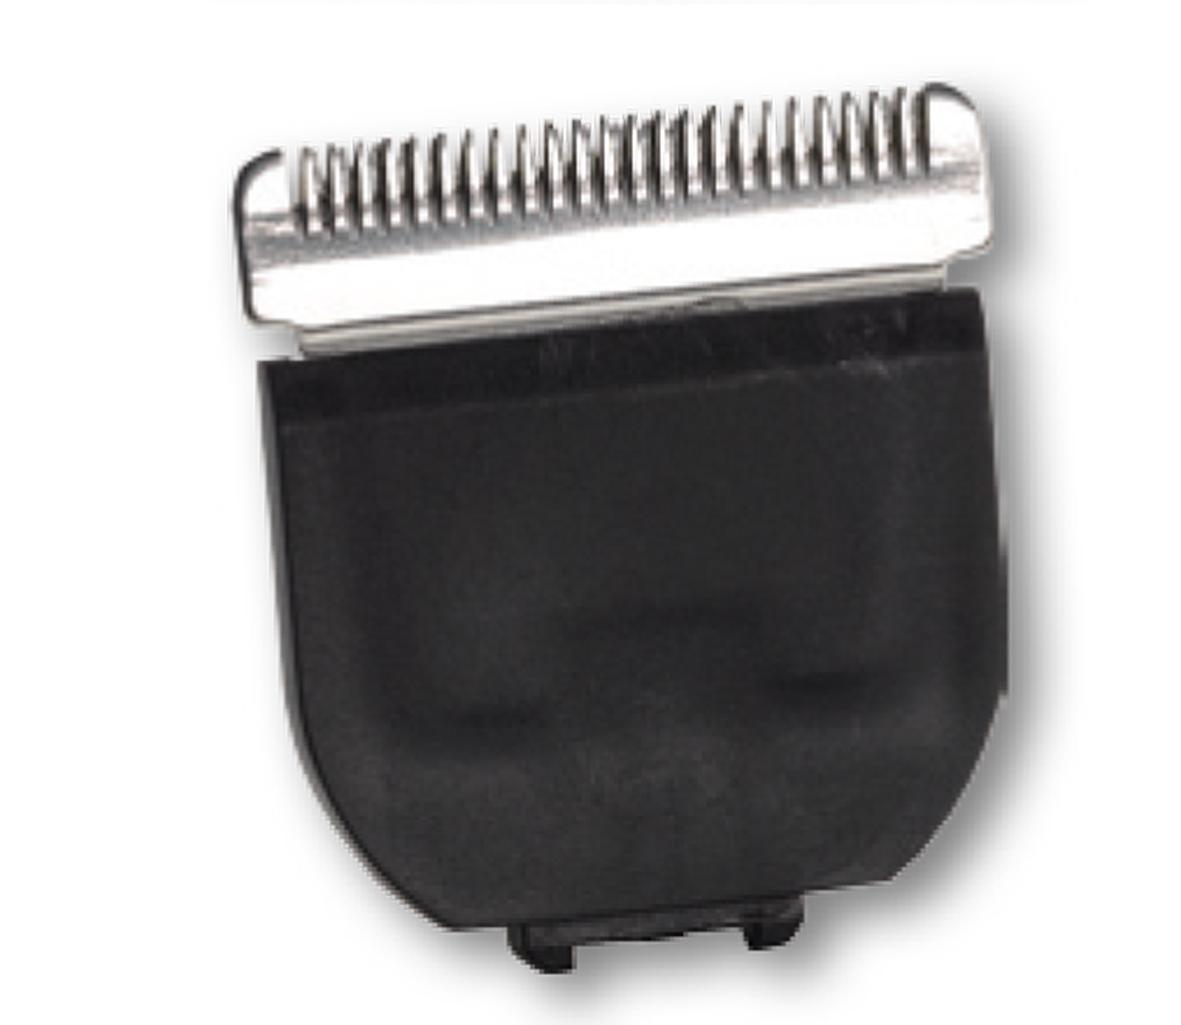 Kiepe Blade 640 - náhradní stříhací hlava na strojek 6320 a 6340